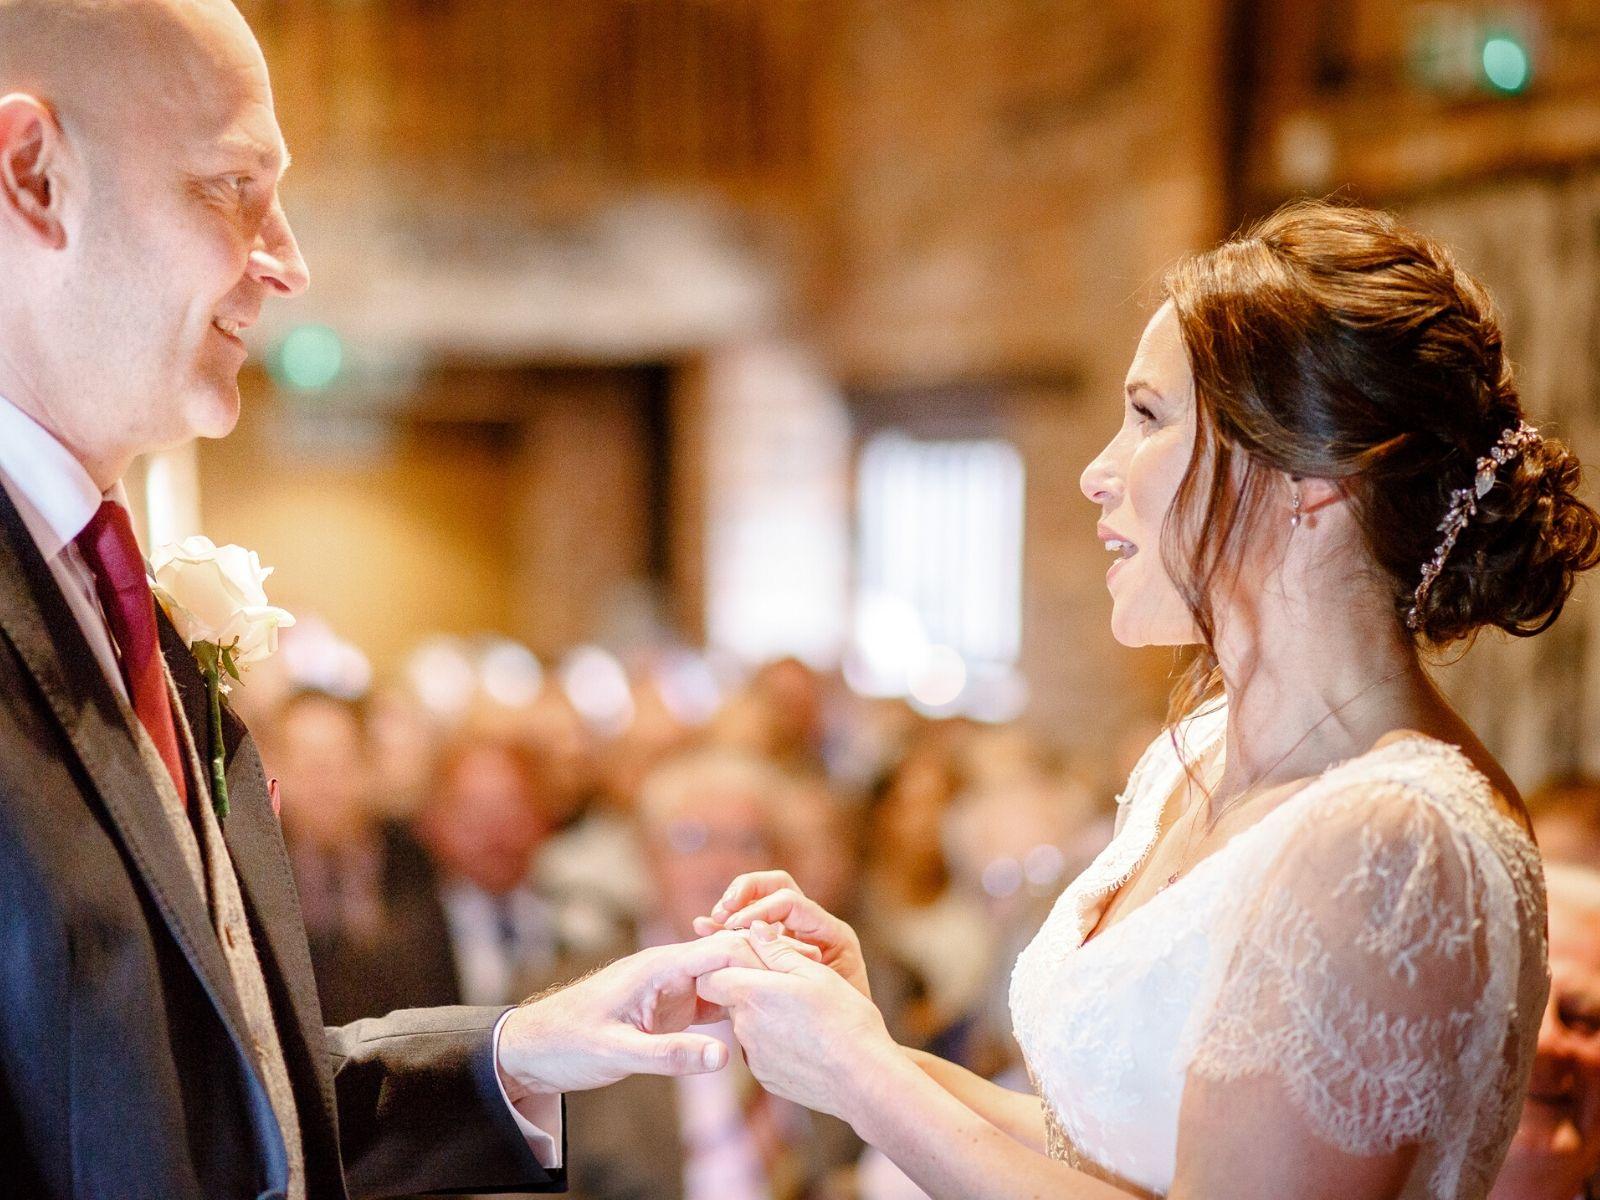 Exchanging vows at wedding venue Curradine Barns Shrawley